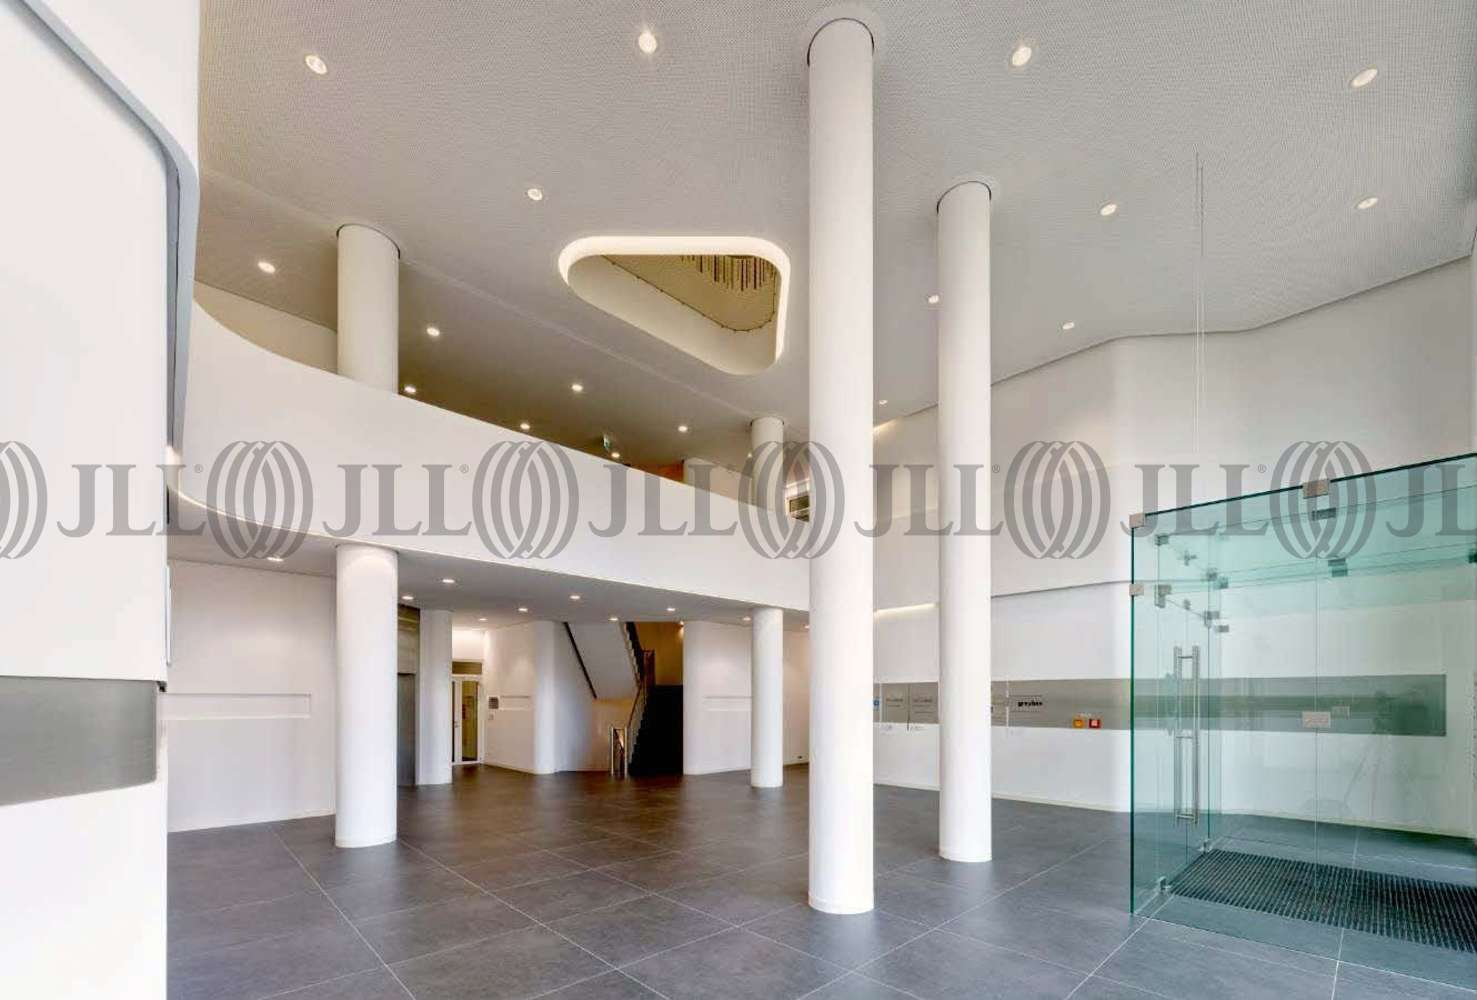 Büros Frankfurt am main, 60439 - Büro - Frankfurt am Main, Niederursel - F1061 - 10563734